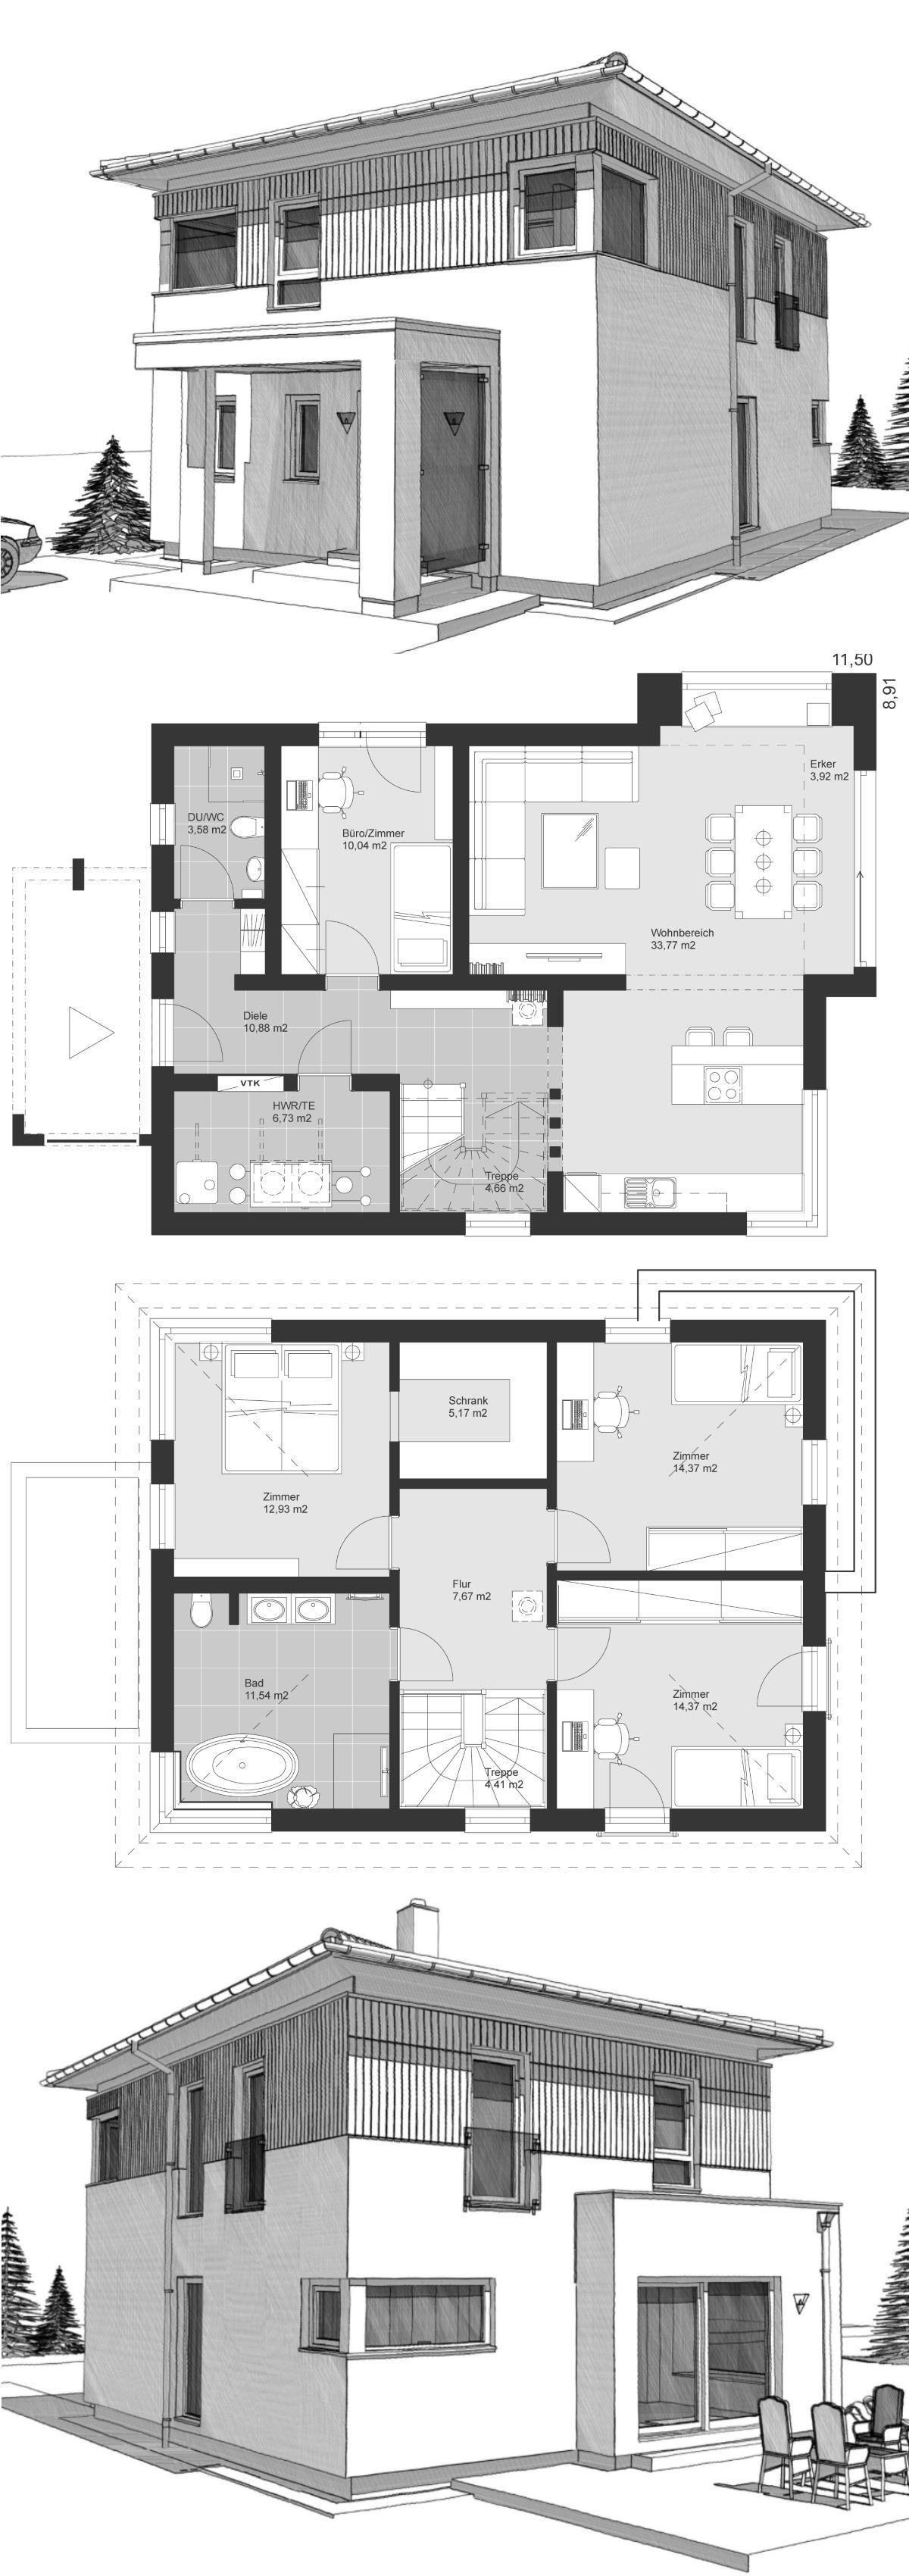 ELK House 140 in a modern Alpine style – ELK prefabricated house | direct construction  – HausbauDirekt